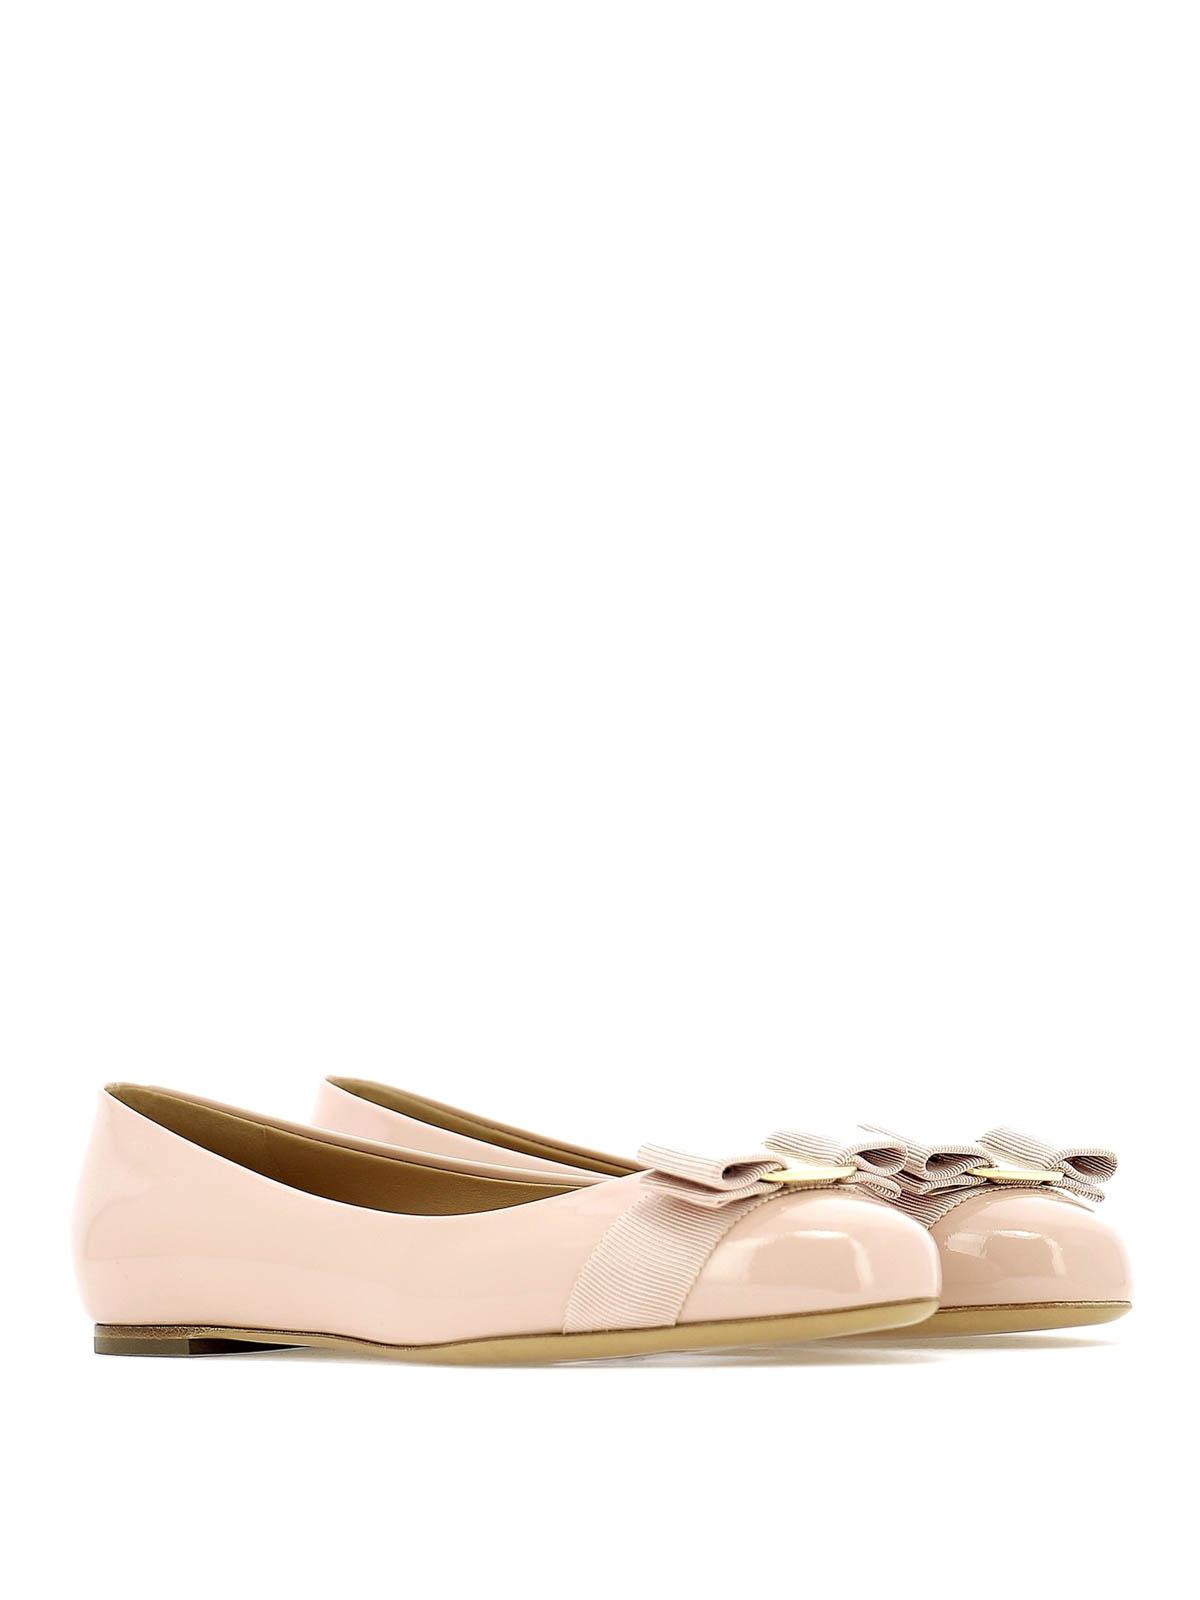 48a5168941763 SALVATORE FERRAGAMO: flat shoes online - Varina light pink patent leather  flat shoes